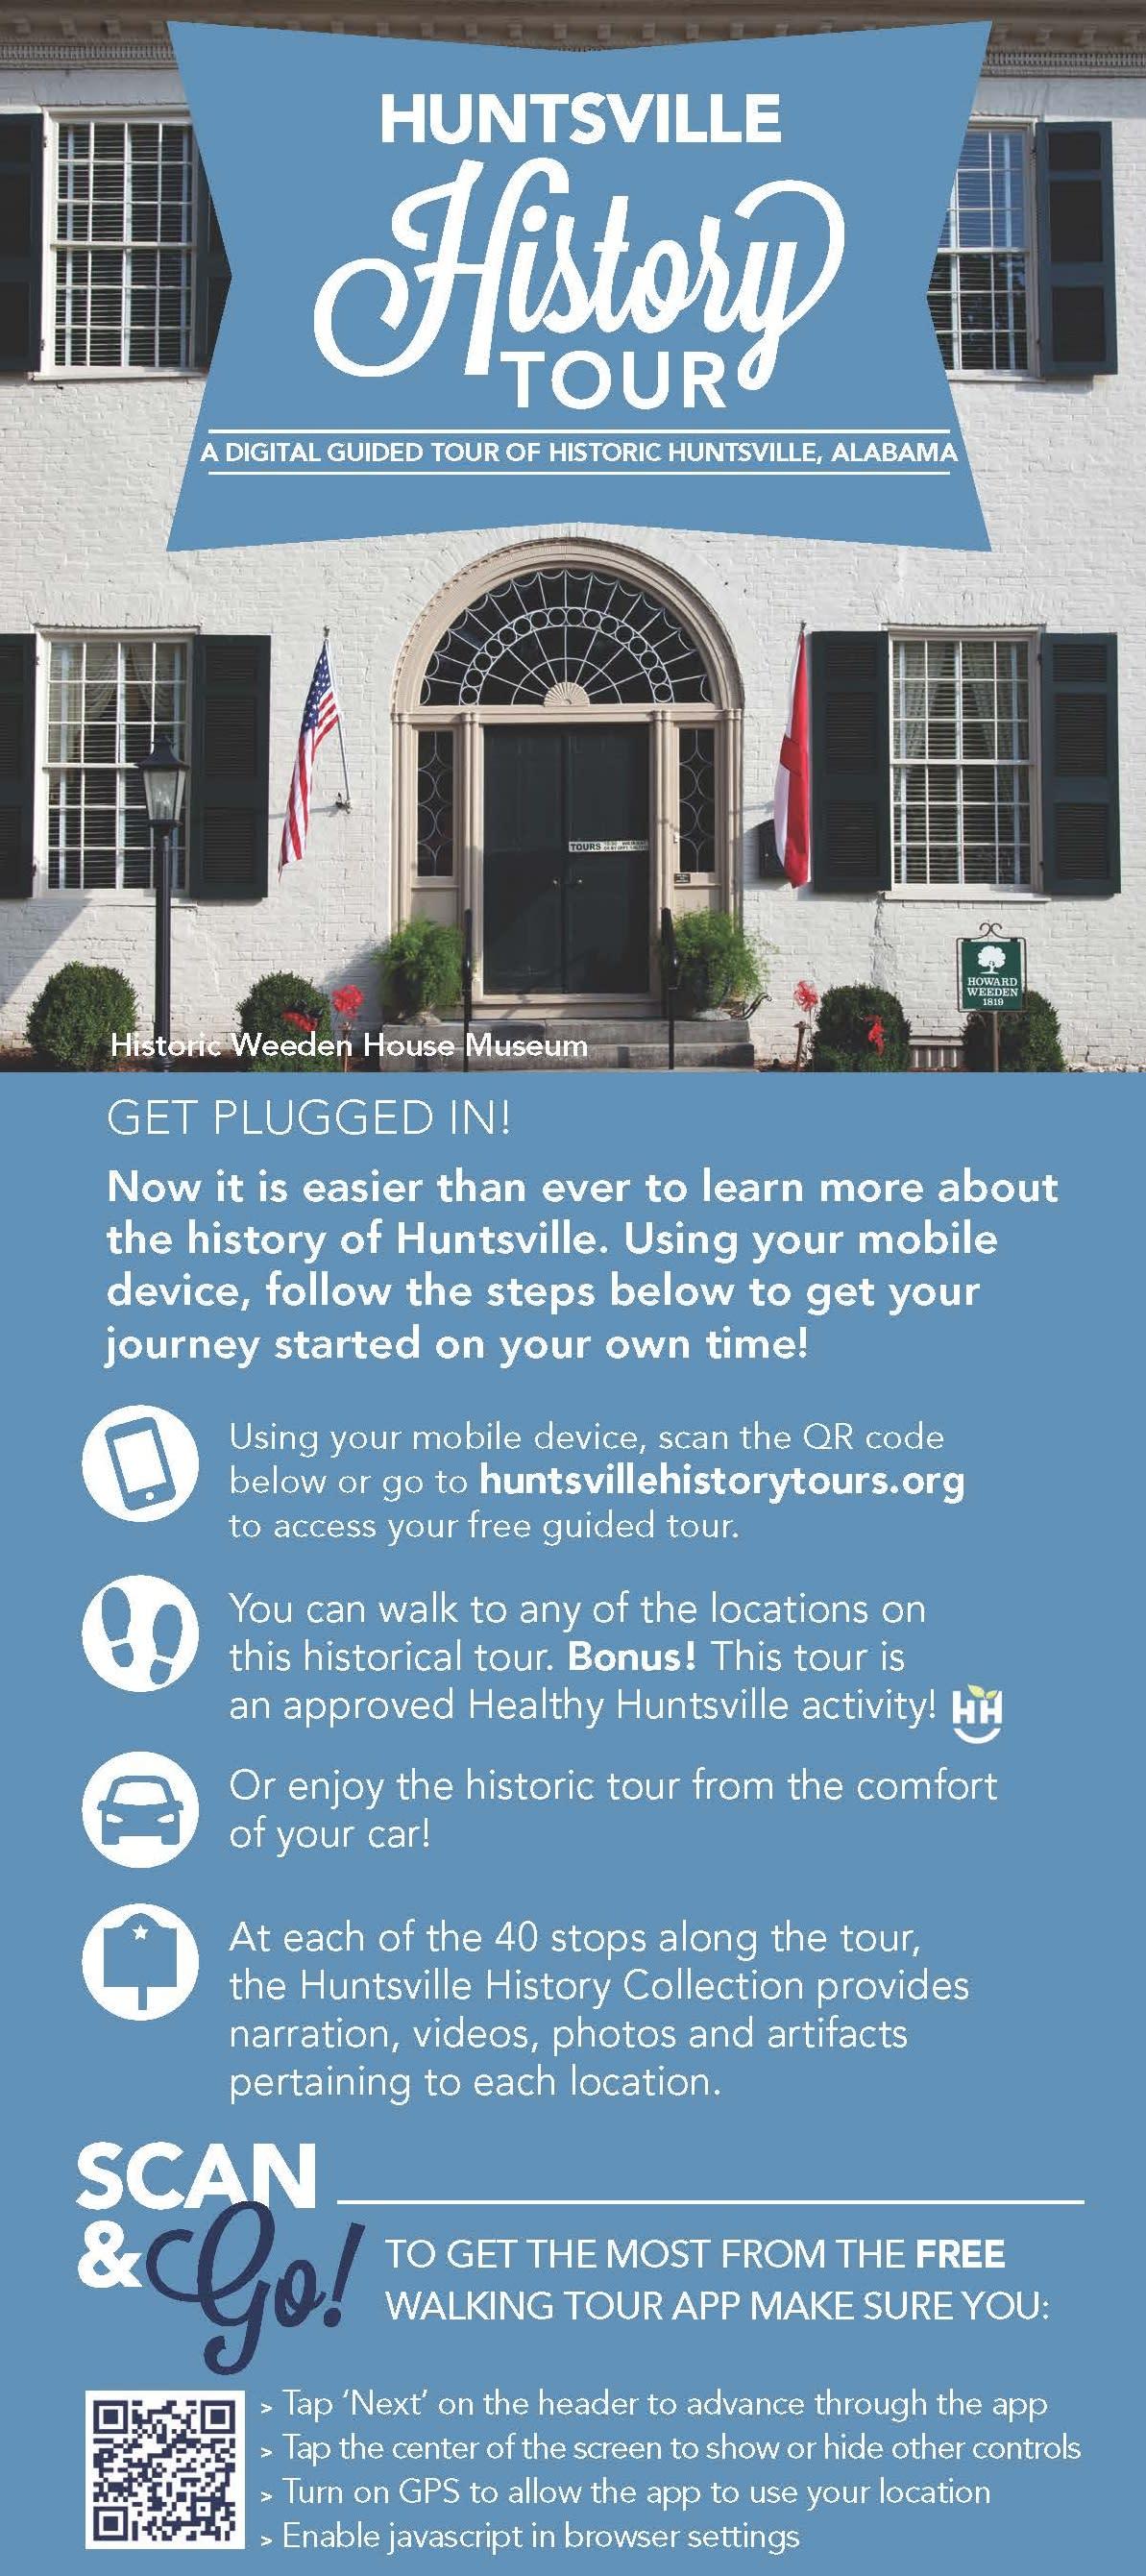 Digital Huntsville History Tour Rack Card Side 1